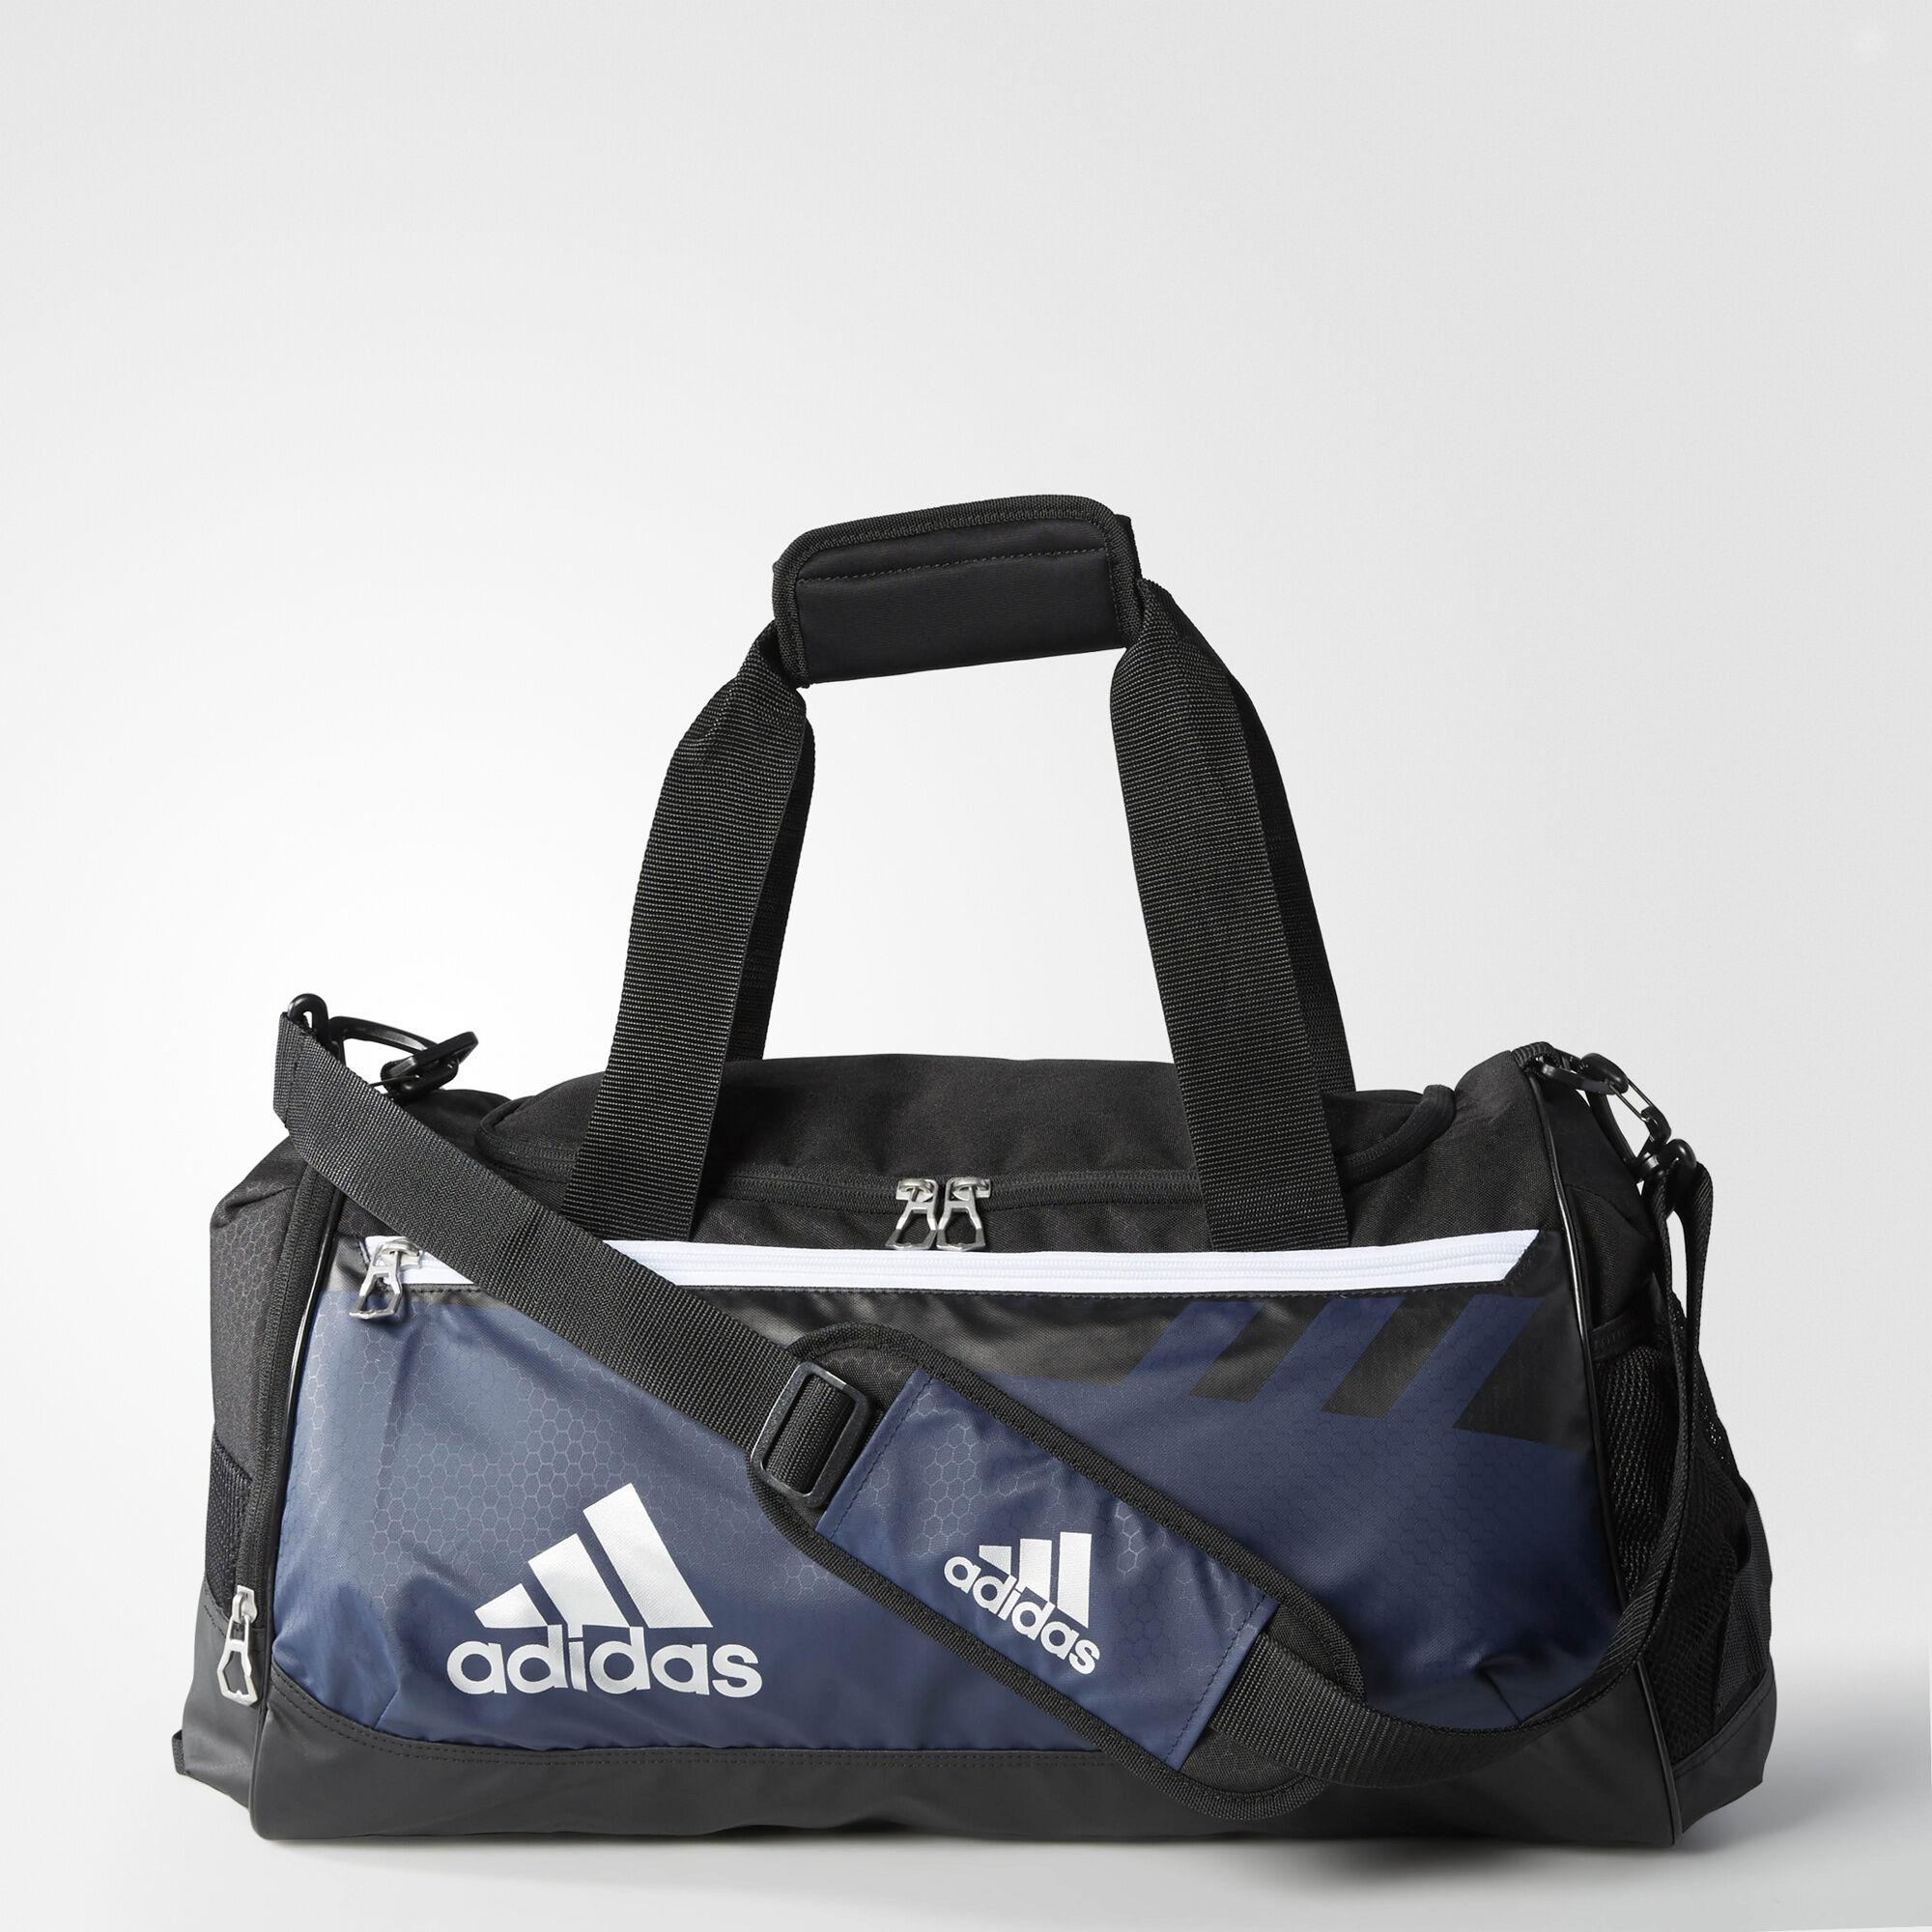 adidas large duffel bag on sale   OFF51% Discounts 8ace6c15e8465